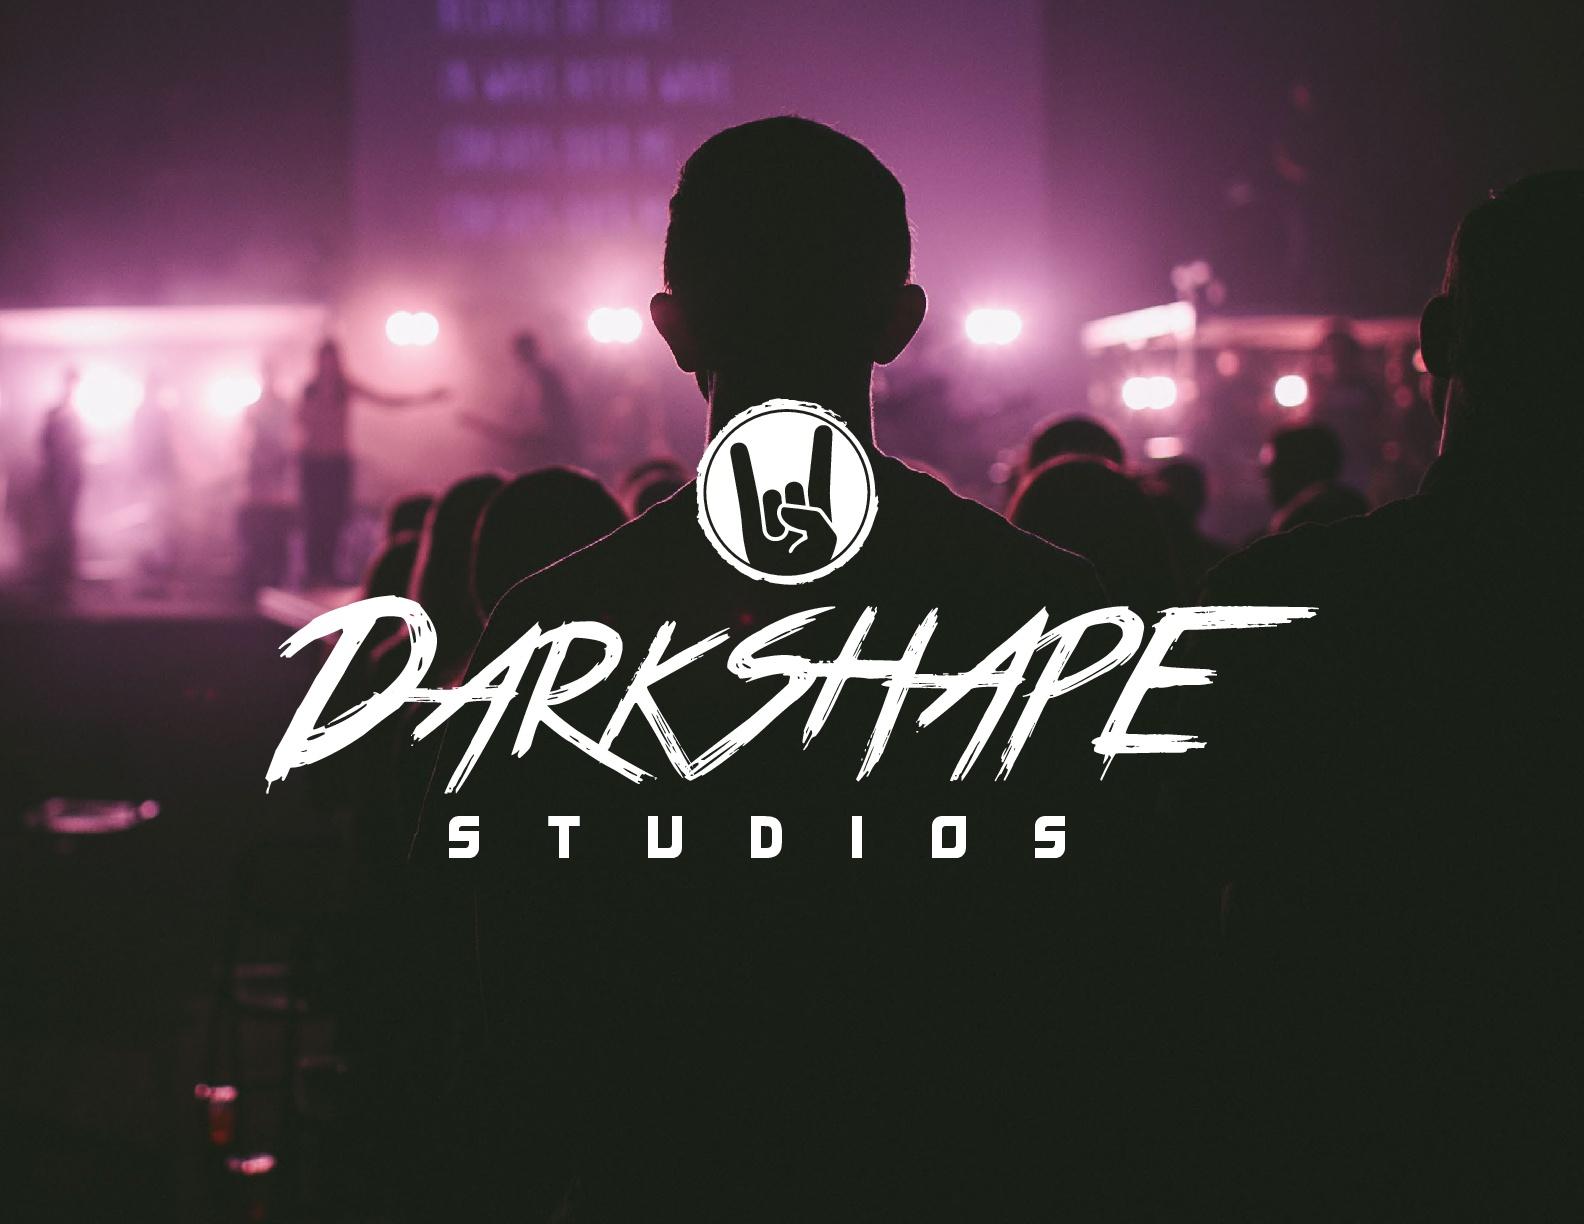 Dark-shape-studios-004